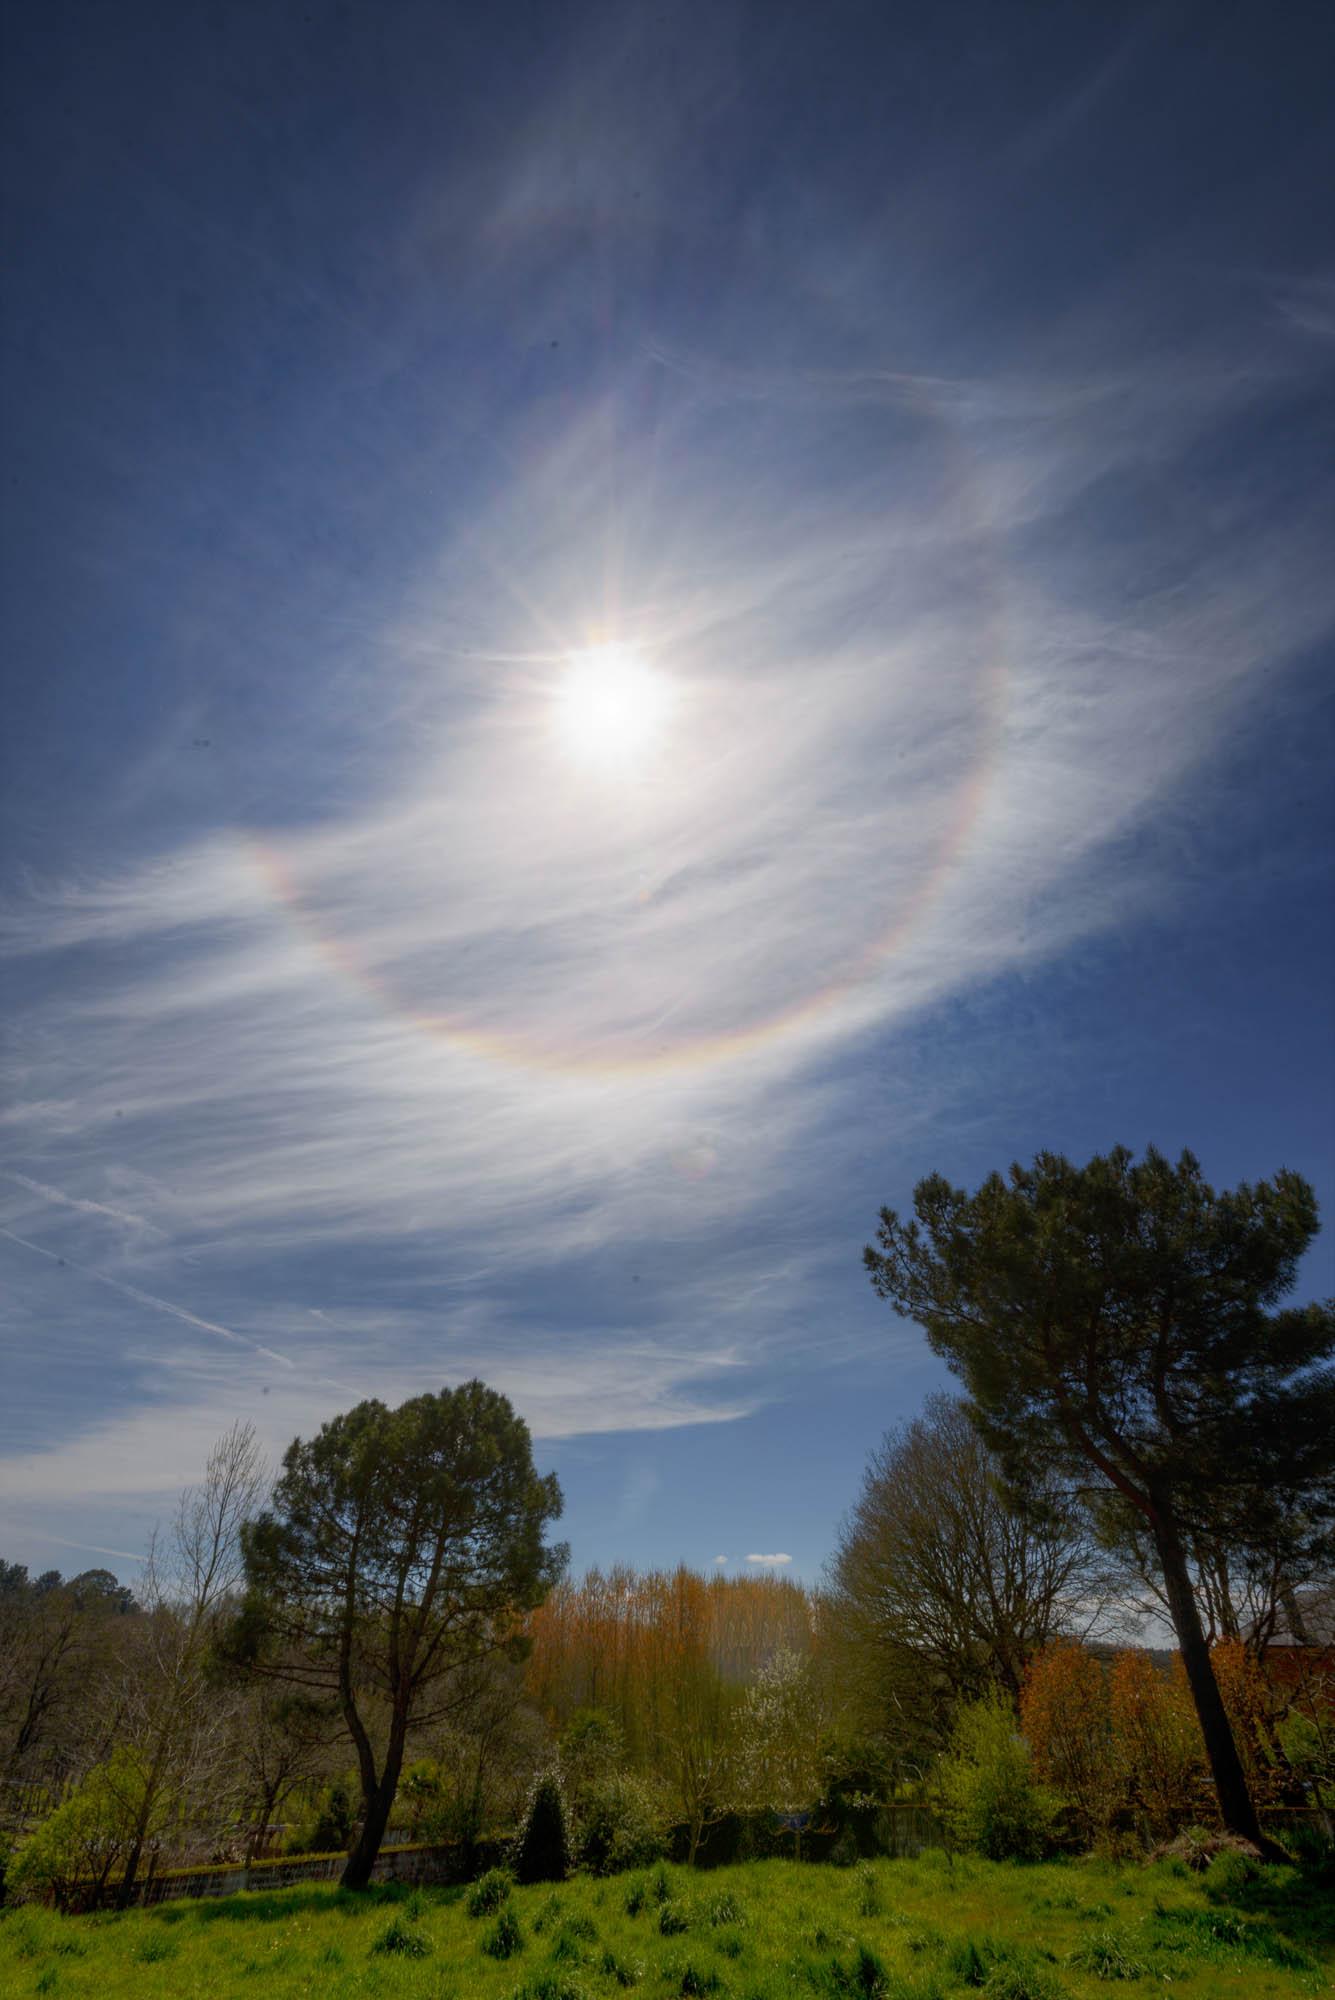 Atmospheric optical phenomenon called parhelion (sun halos) over a group of trees